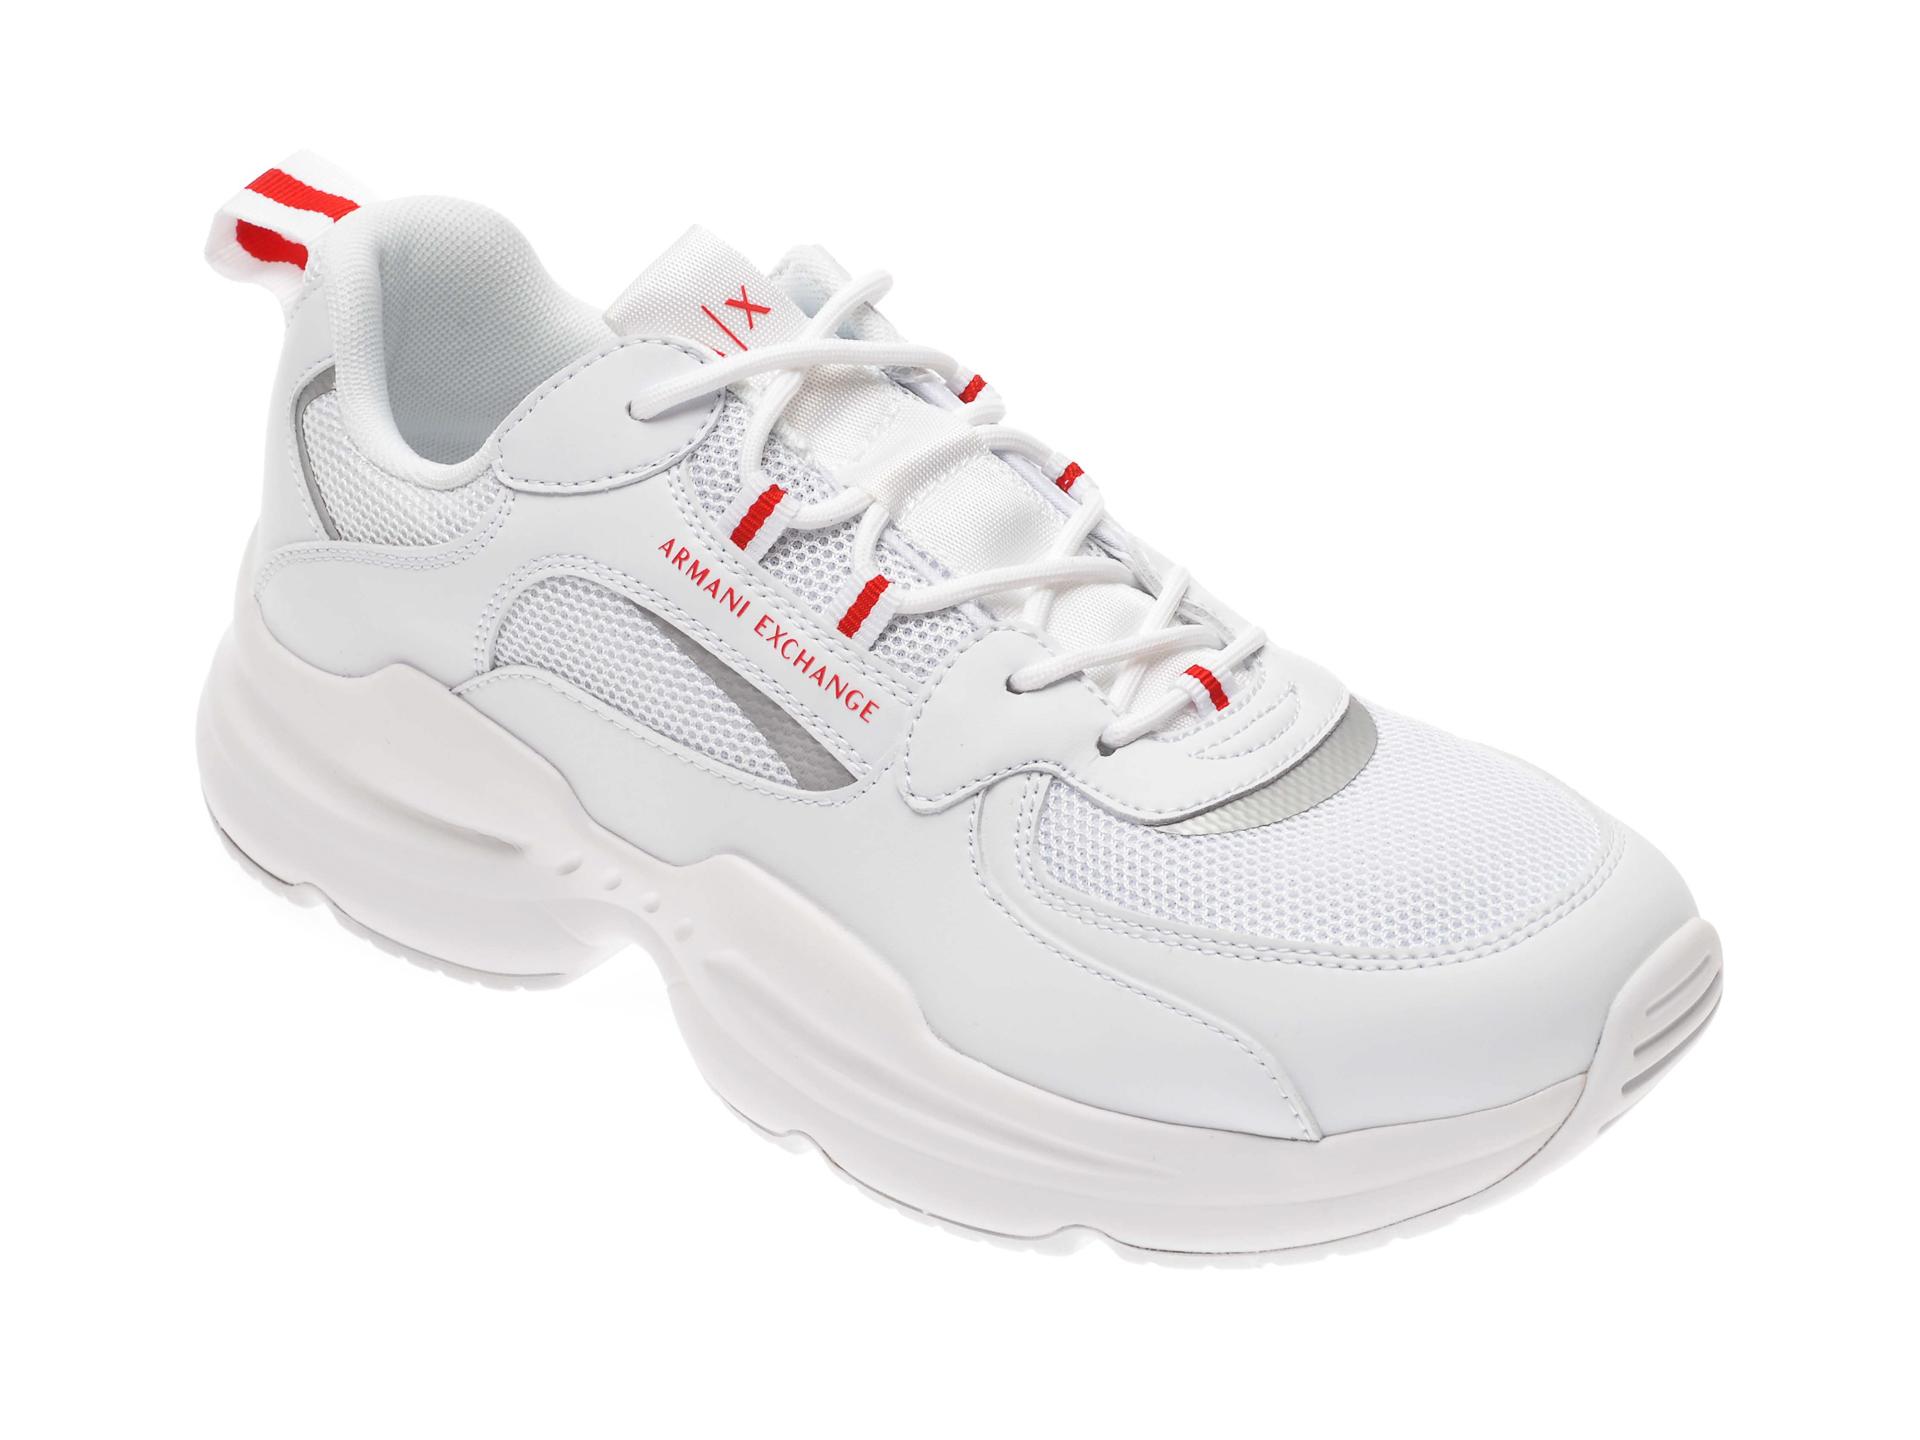 Pantofi sport ARMANI EXCHANGE albi, XUX050, din piele ecologica